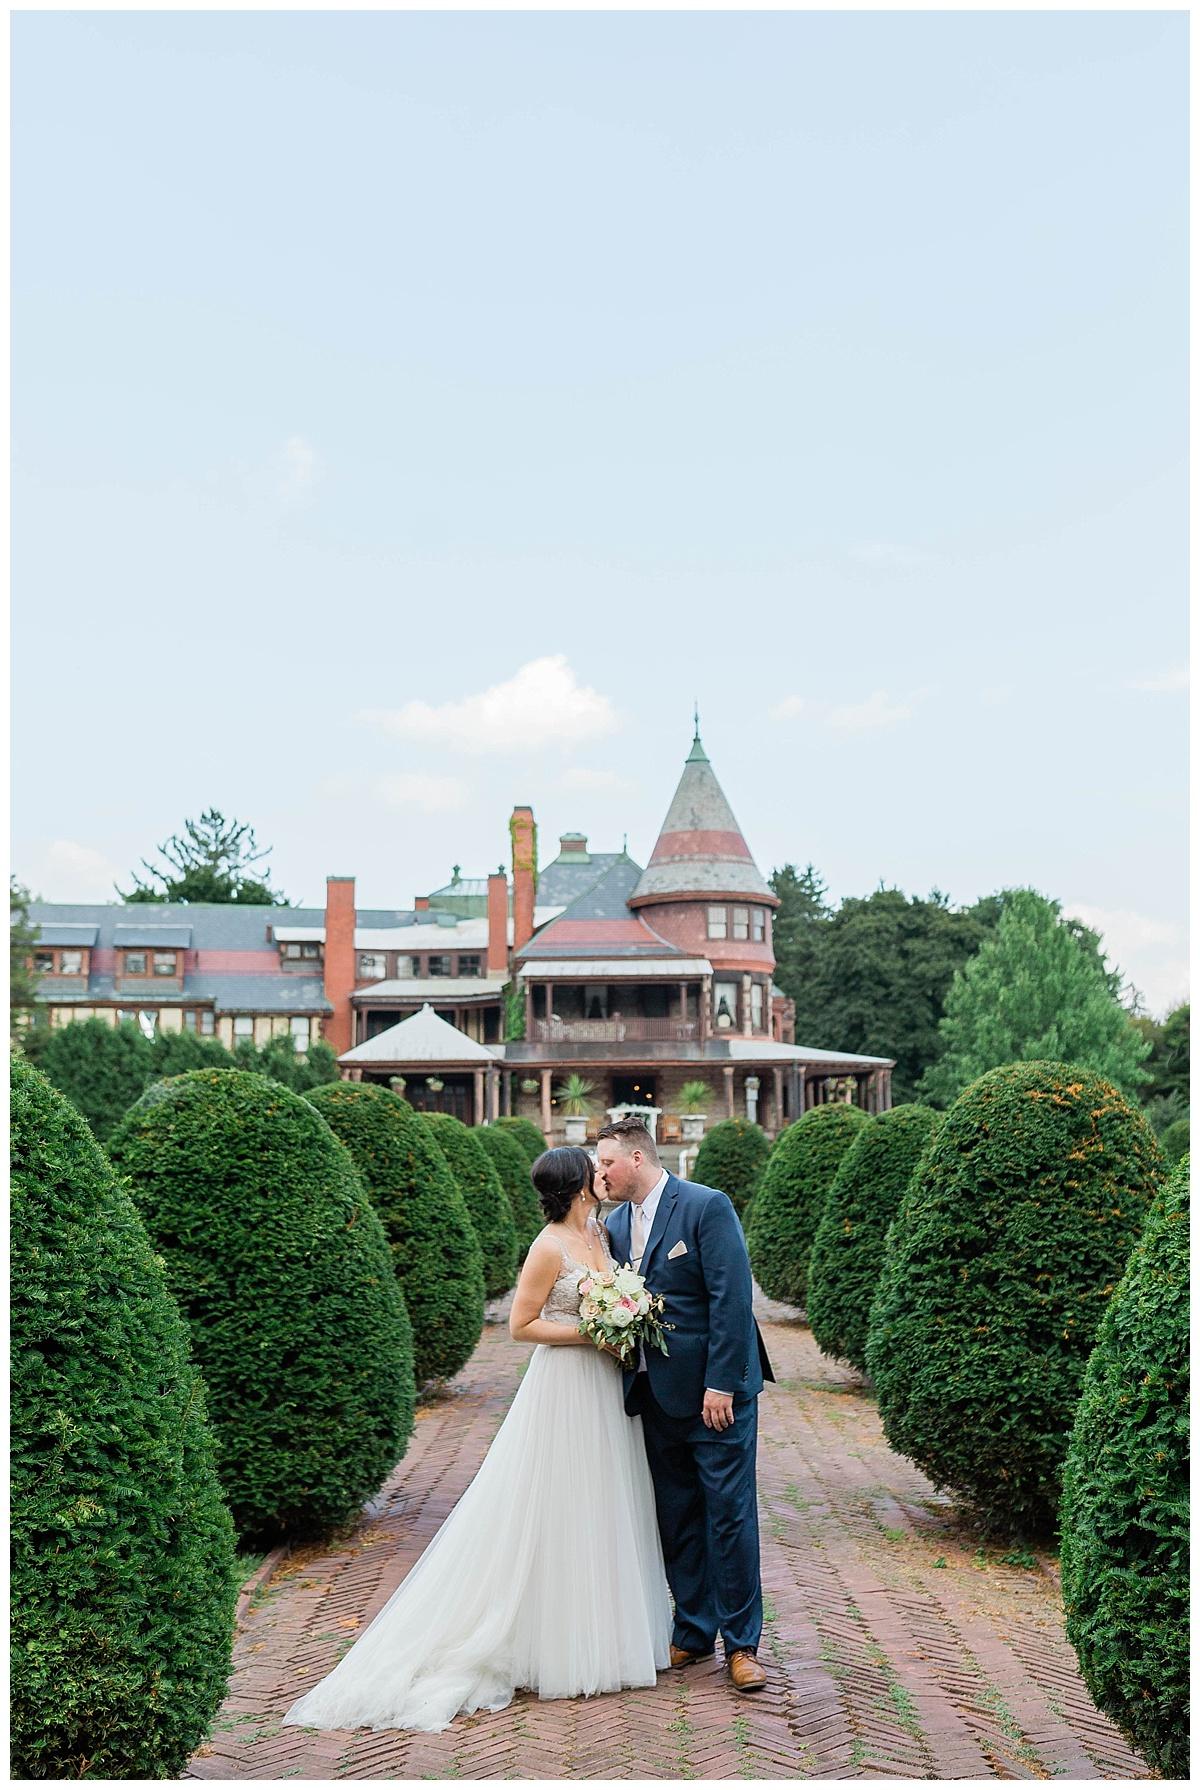 Rachel and Nick - Sonnenberg Gardens Wedding-387.jpg